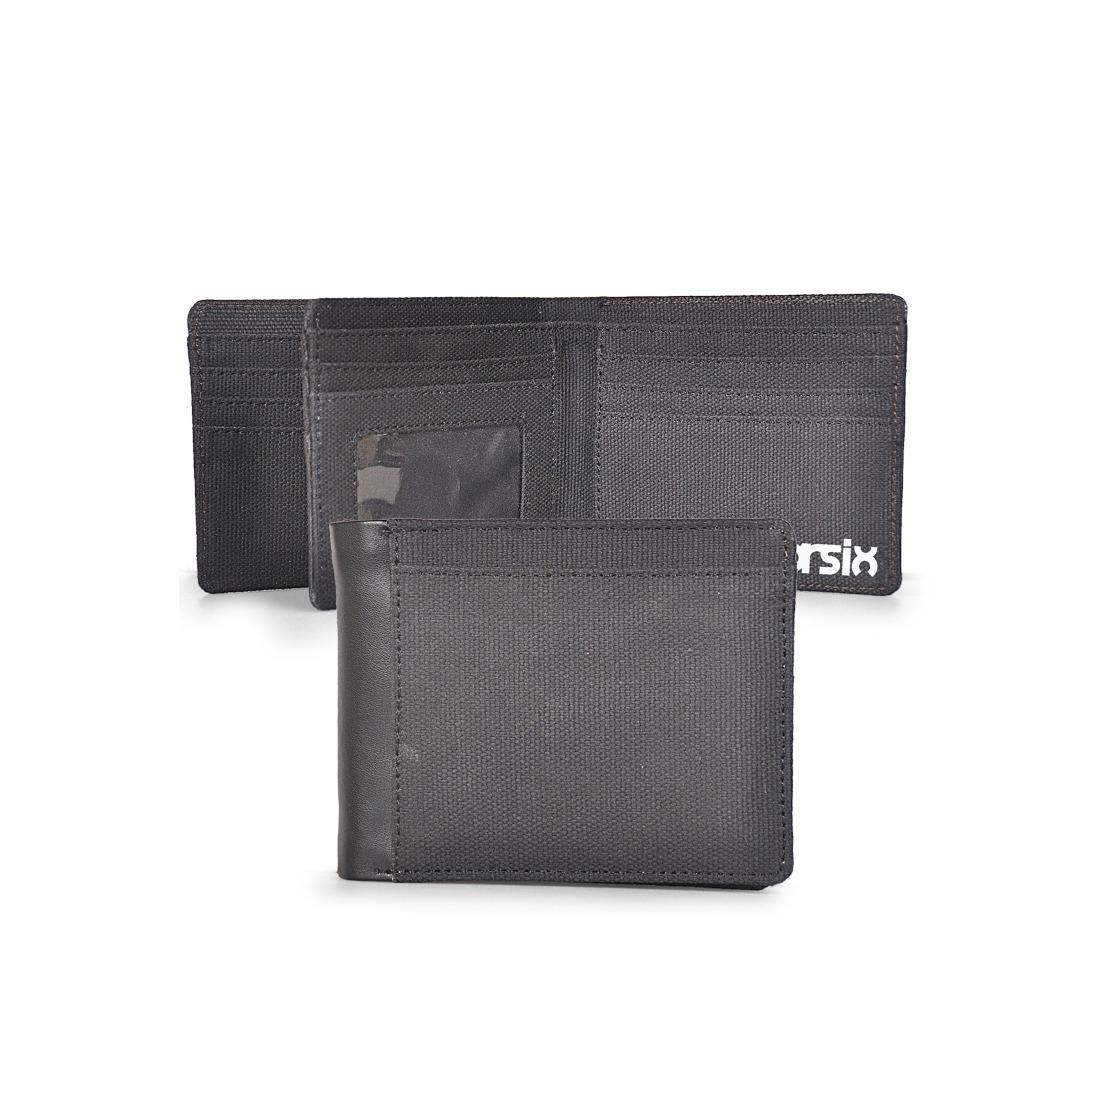 Dompet Pria Canvas Minimalis Hitam - CBR SIX/ GYC 390